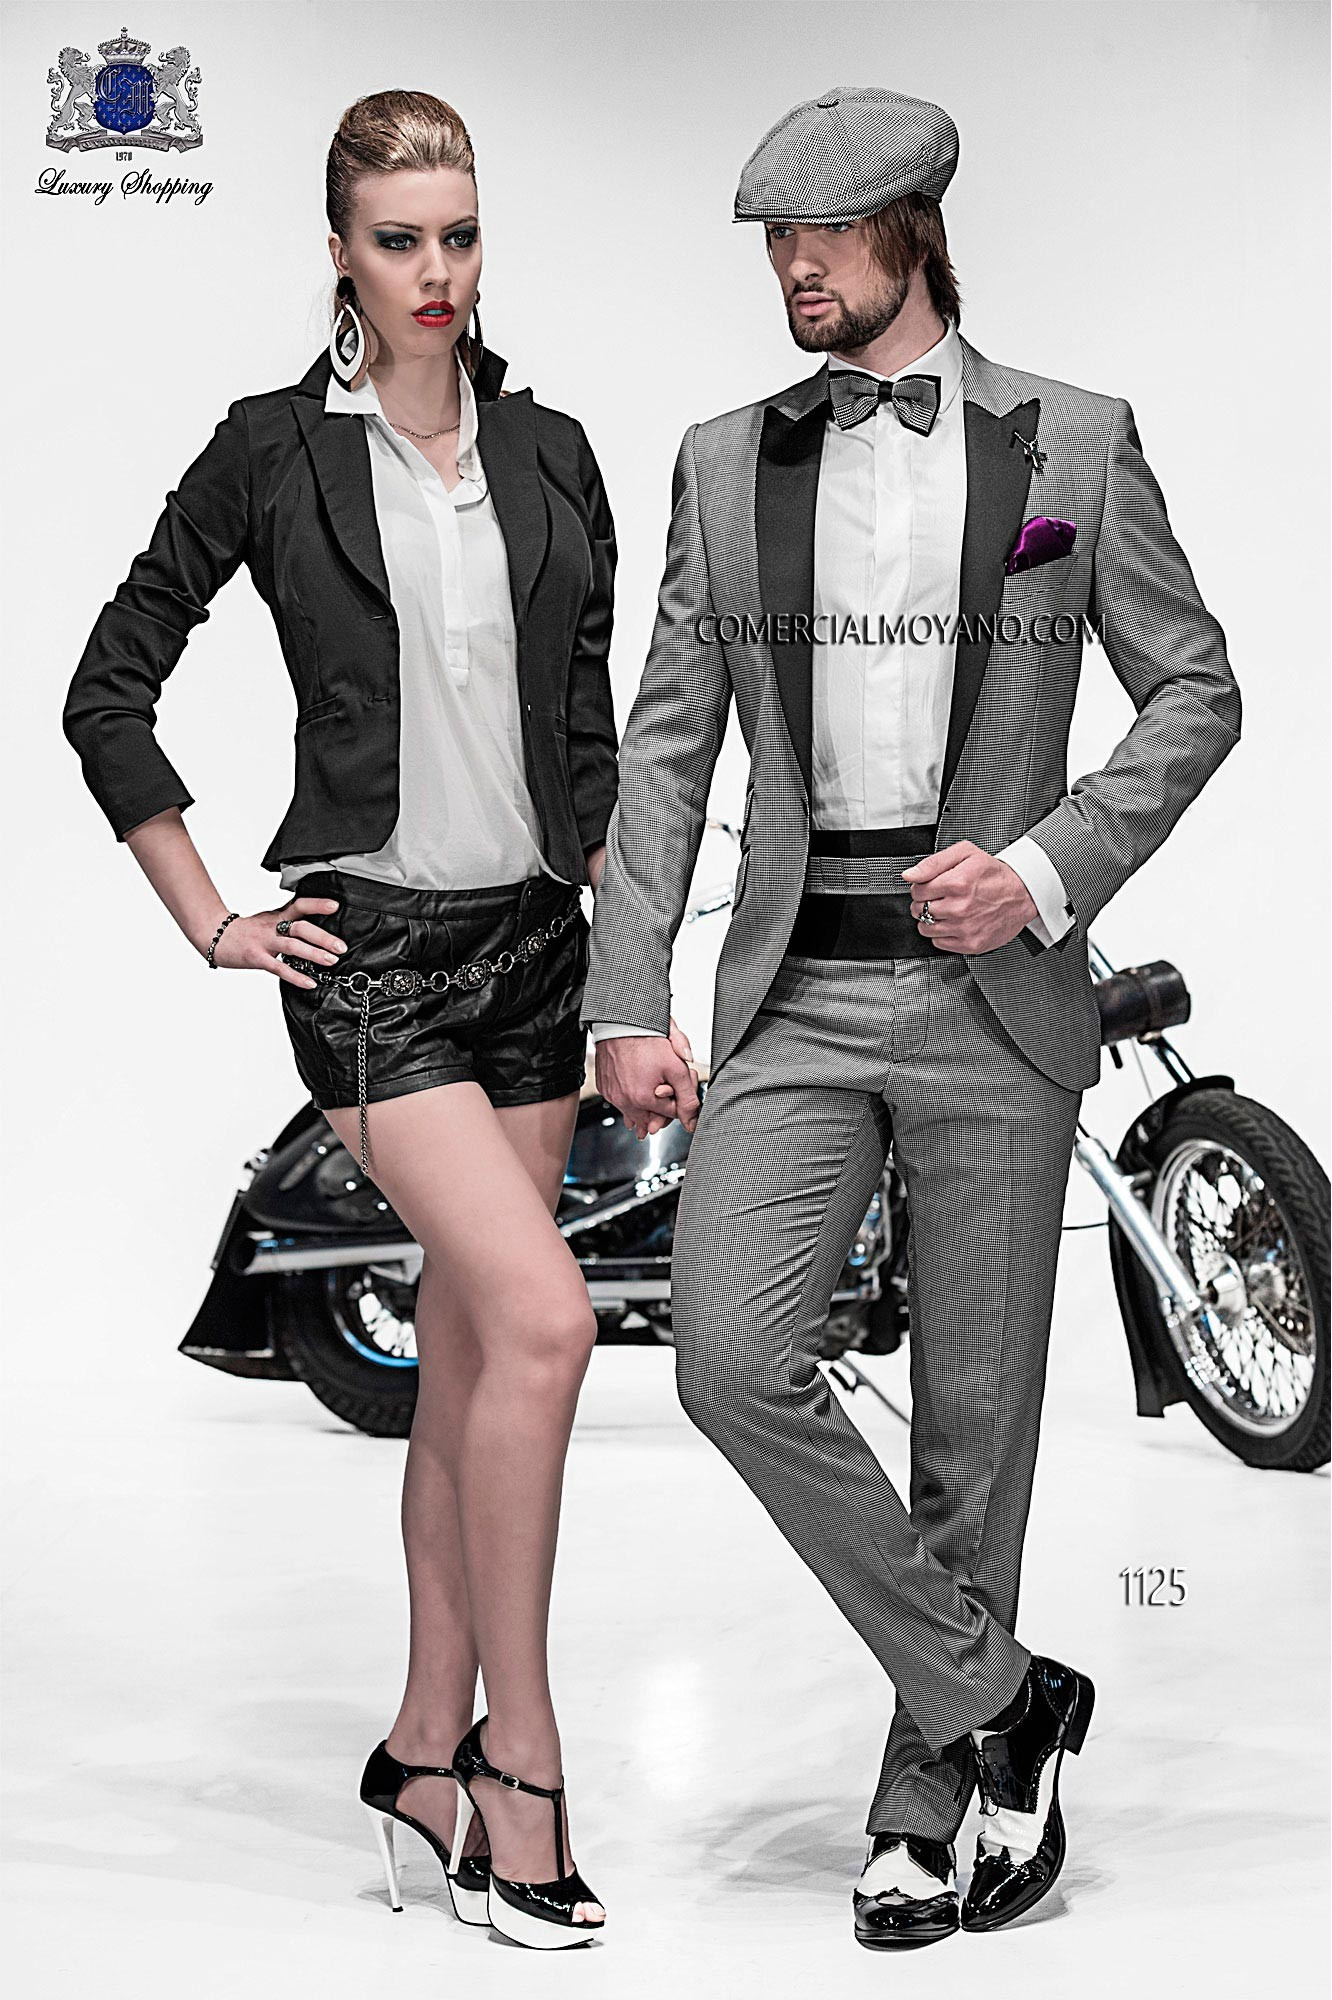 Emotion black/ white men wedding suit model 1125 Ottavio Nuccio Gala